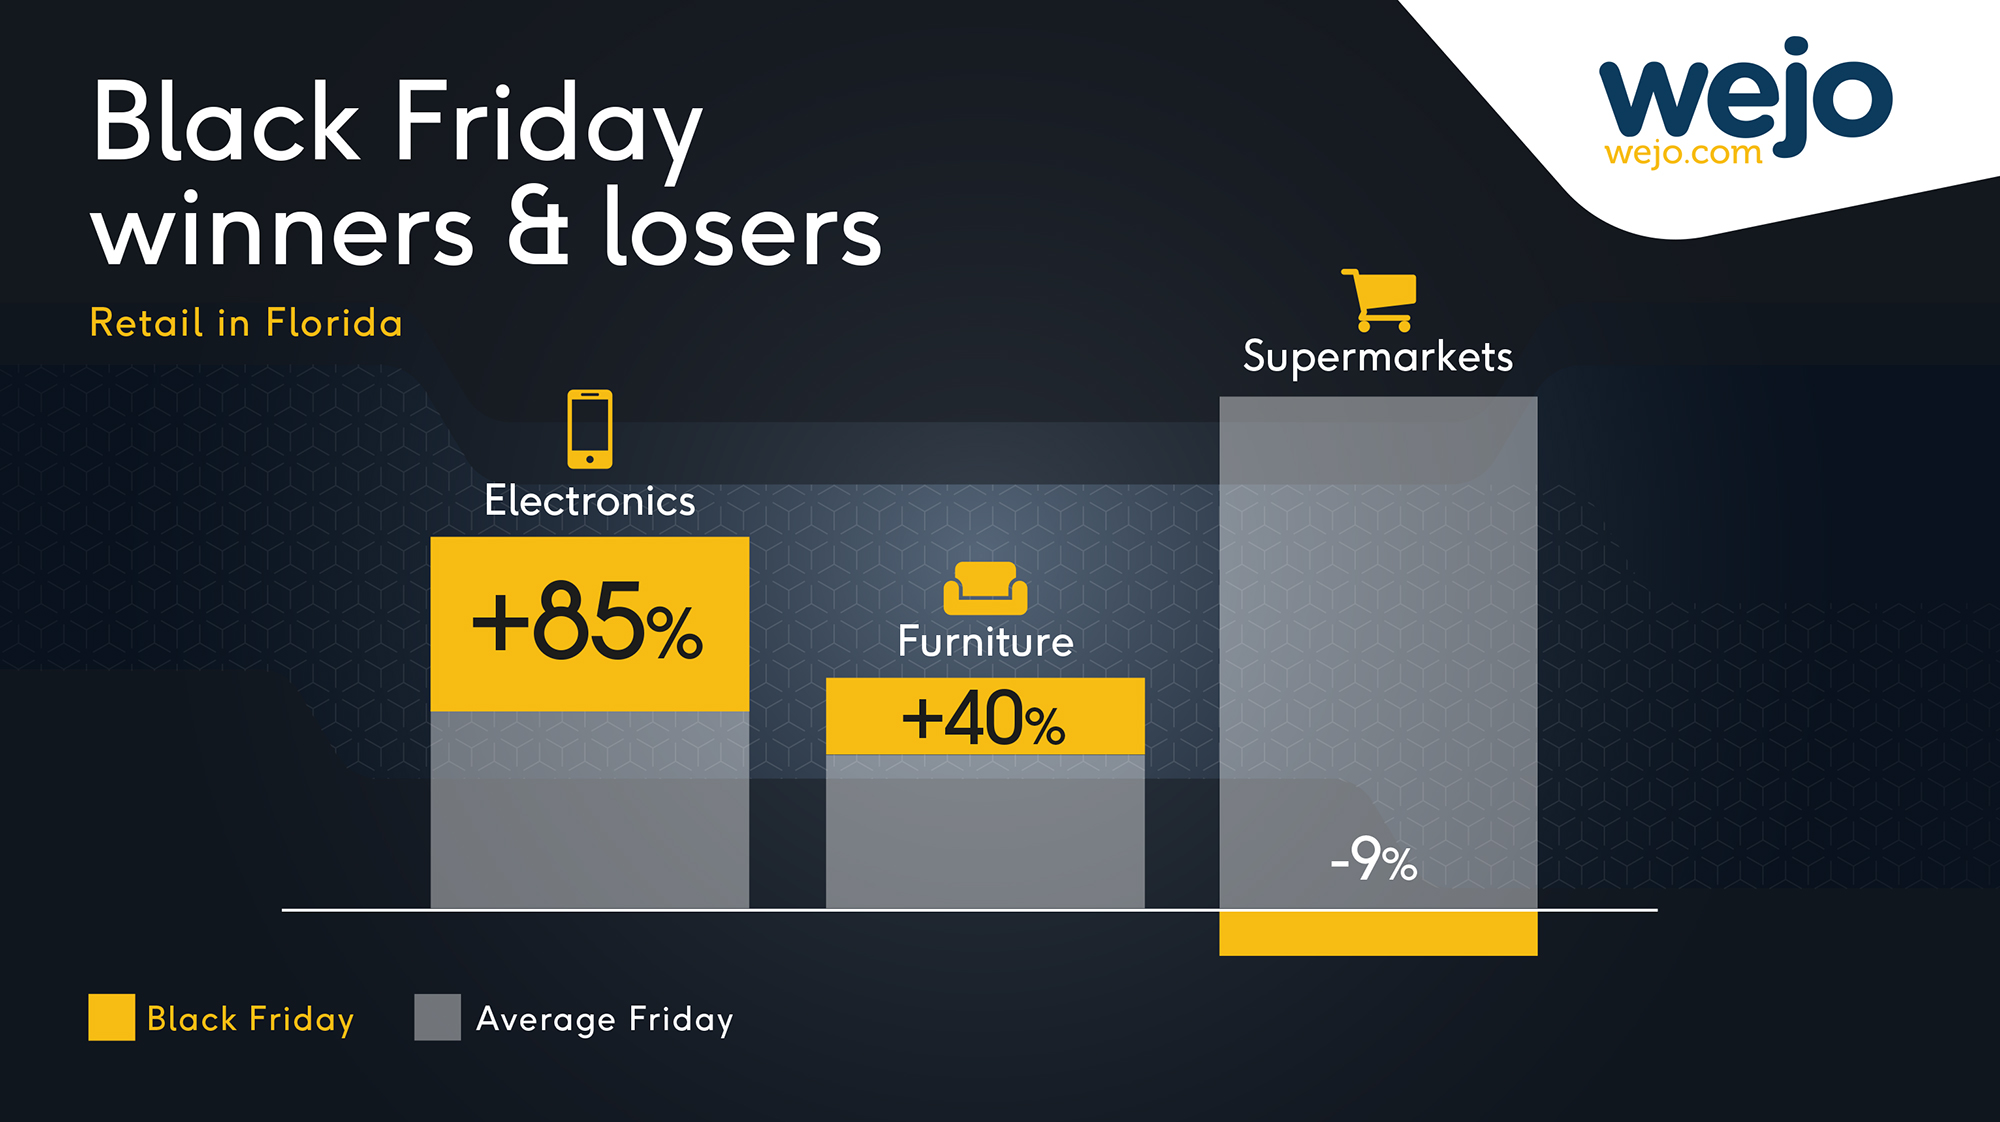 wejo Black Friday data